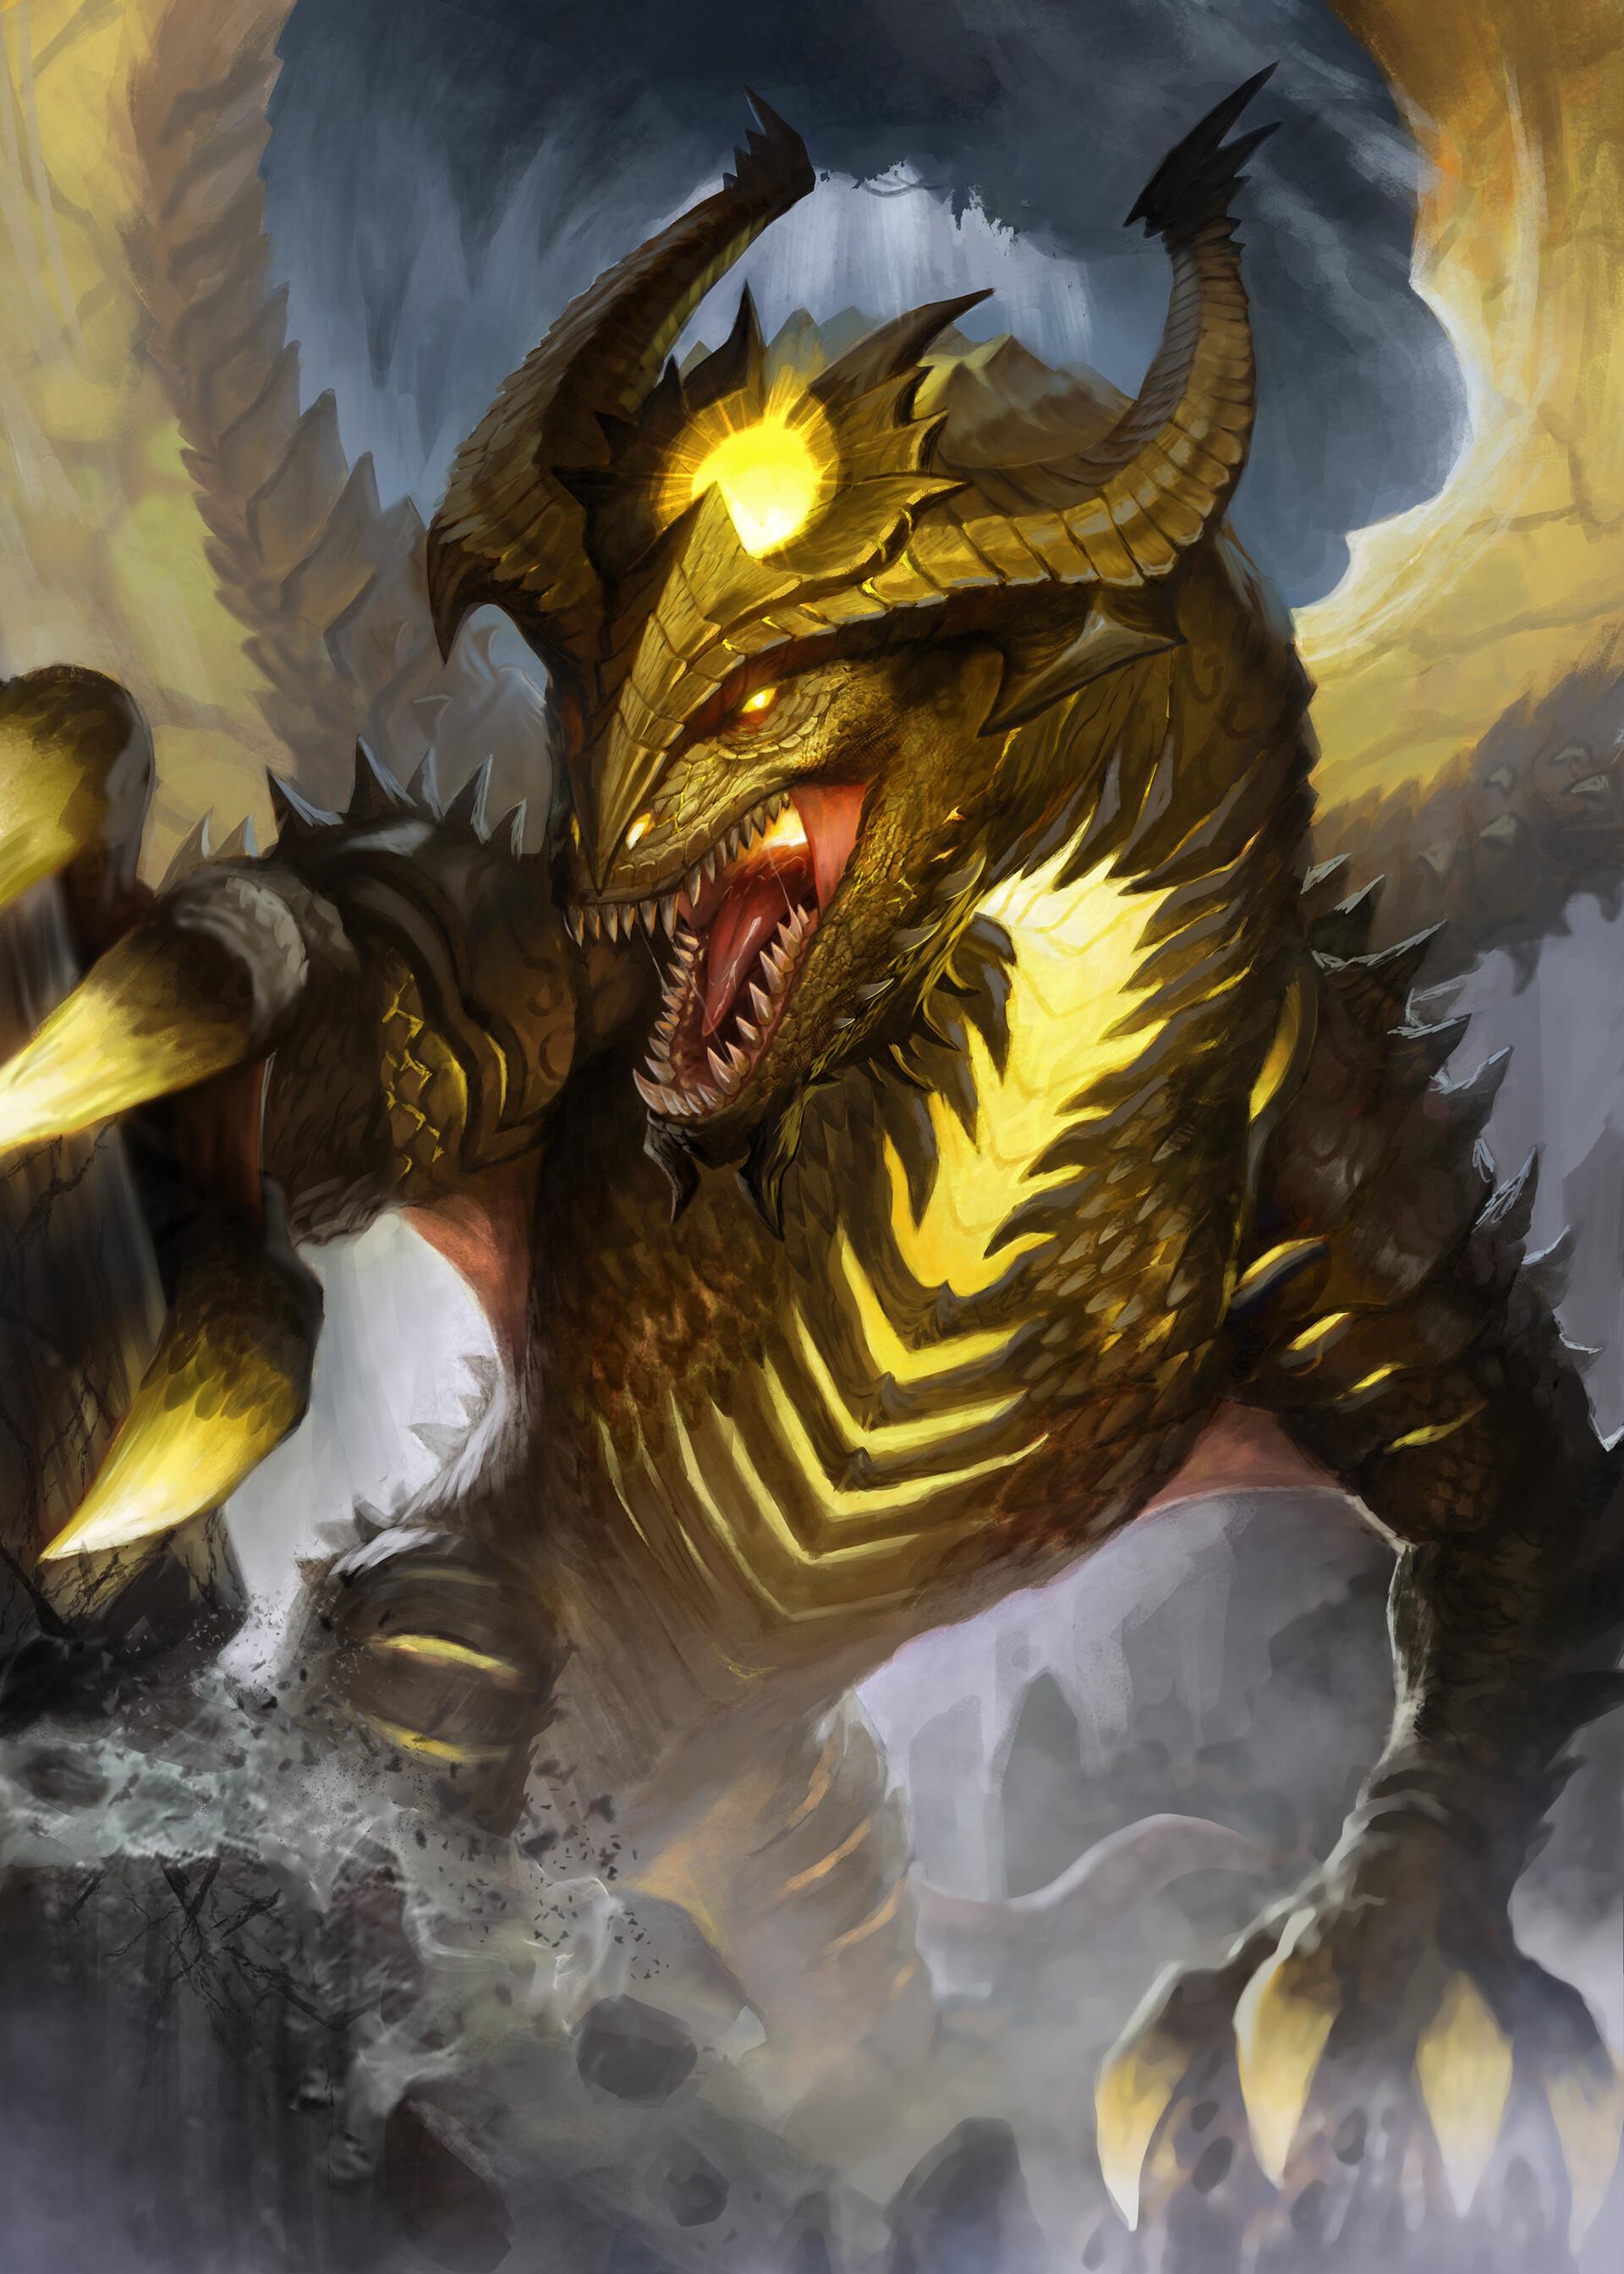 Gold covered dragon art the new organon preface define